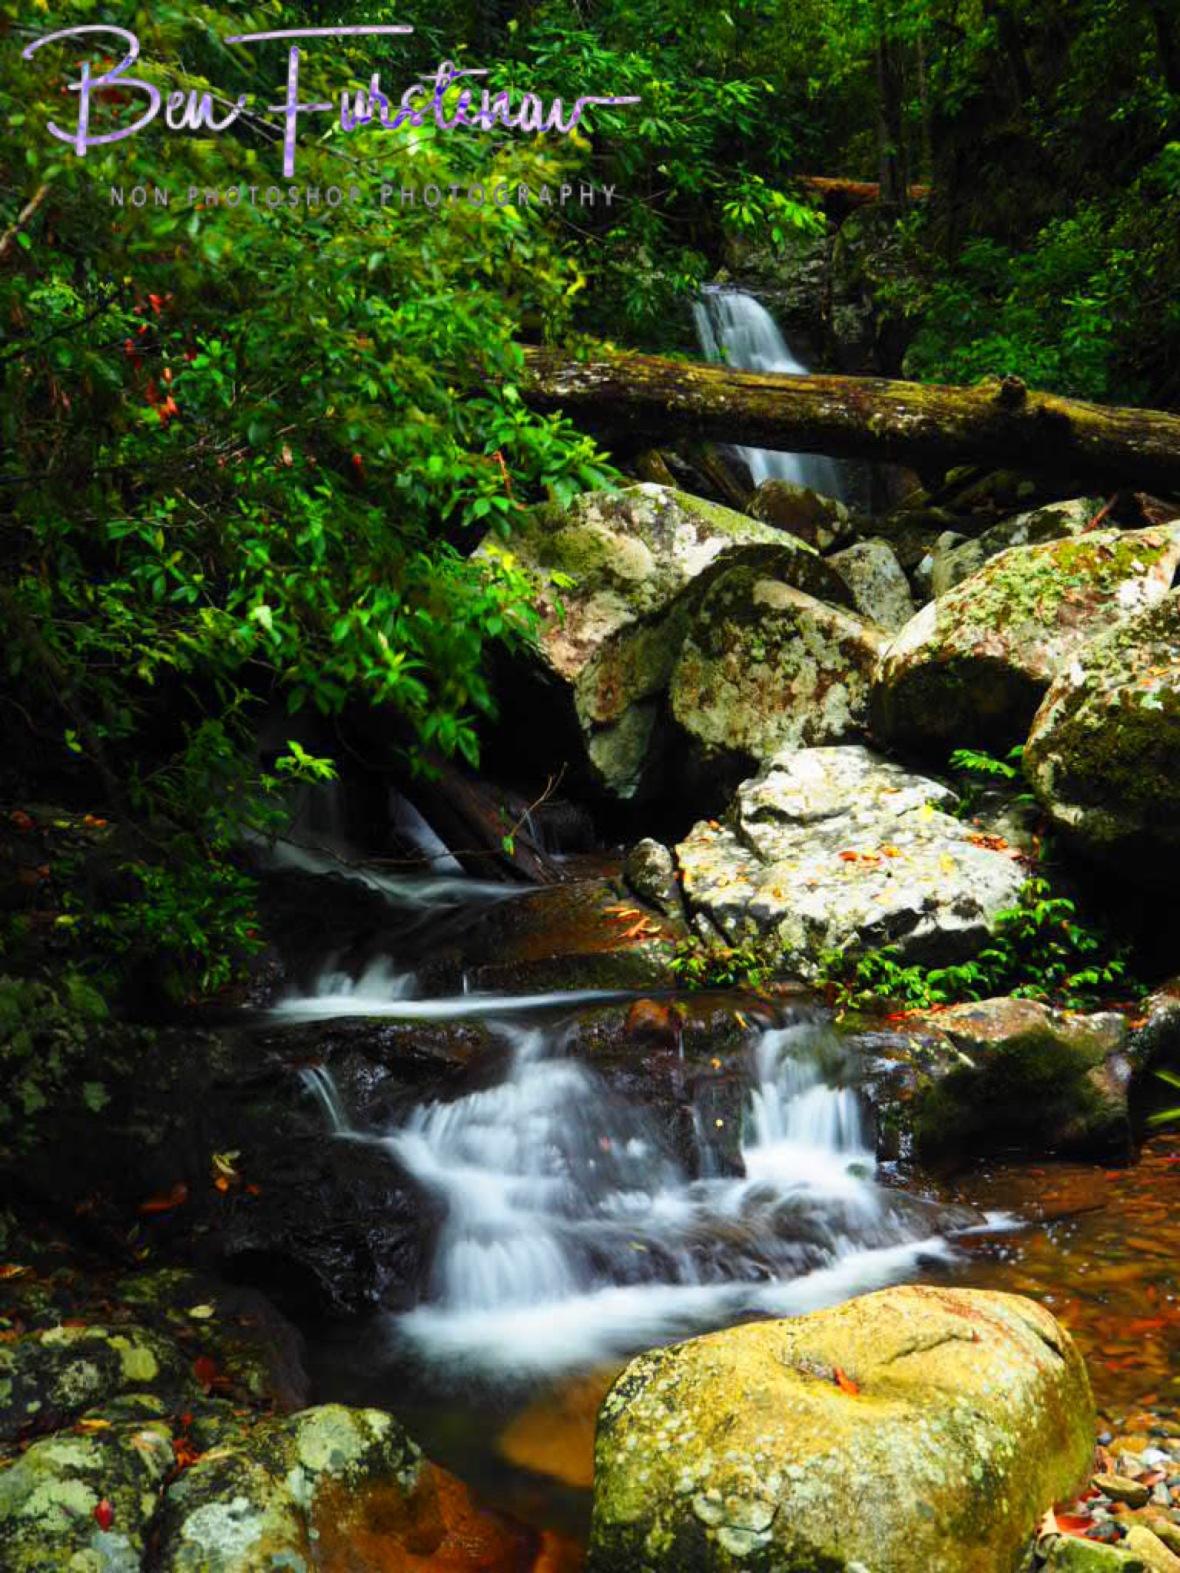 Washed out trees line Washpool Creek, Washpool National Park, NSW, Australia